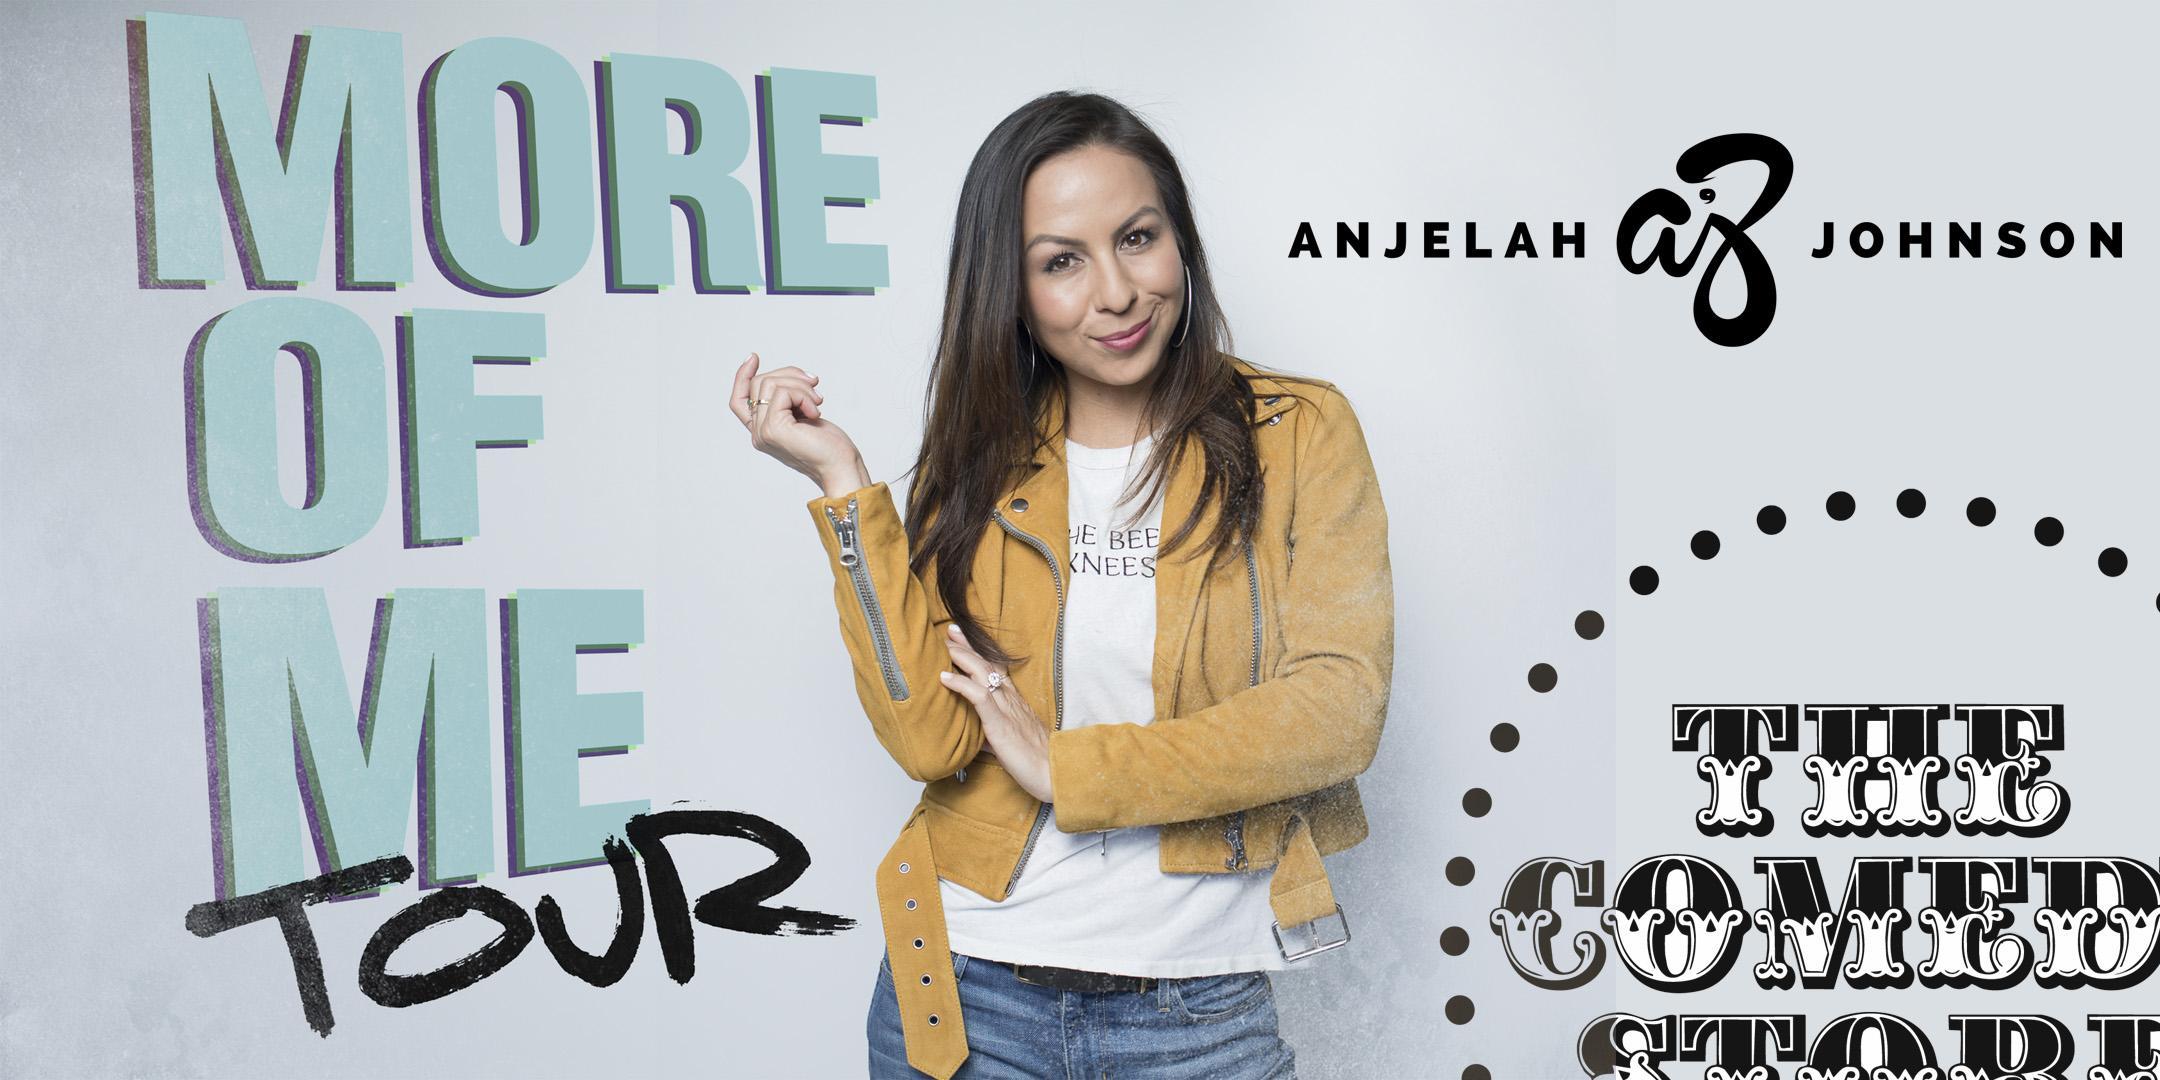 Anjelah Johnson - Saturday - 7:30 & 9:45 pm Showtimes